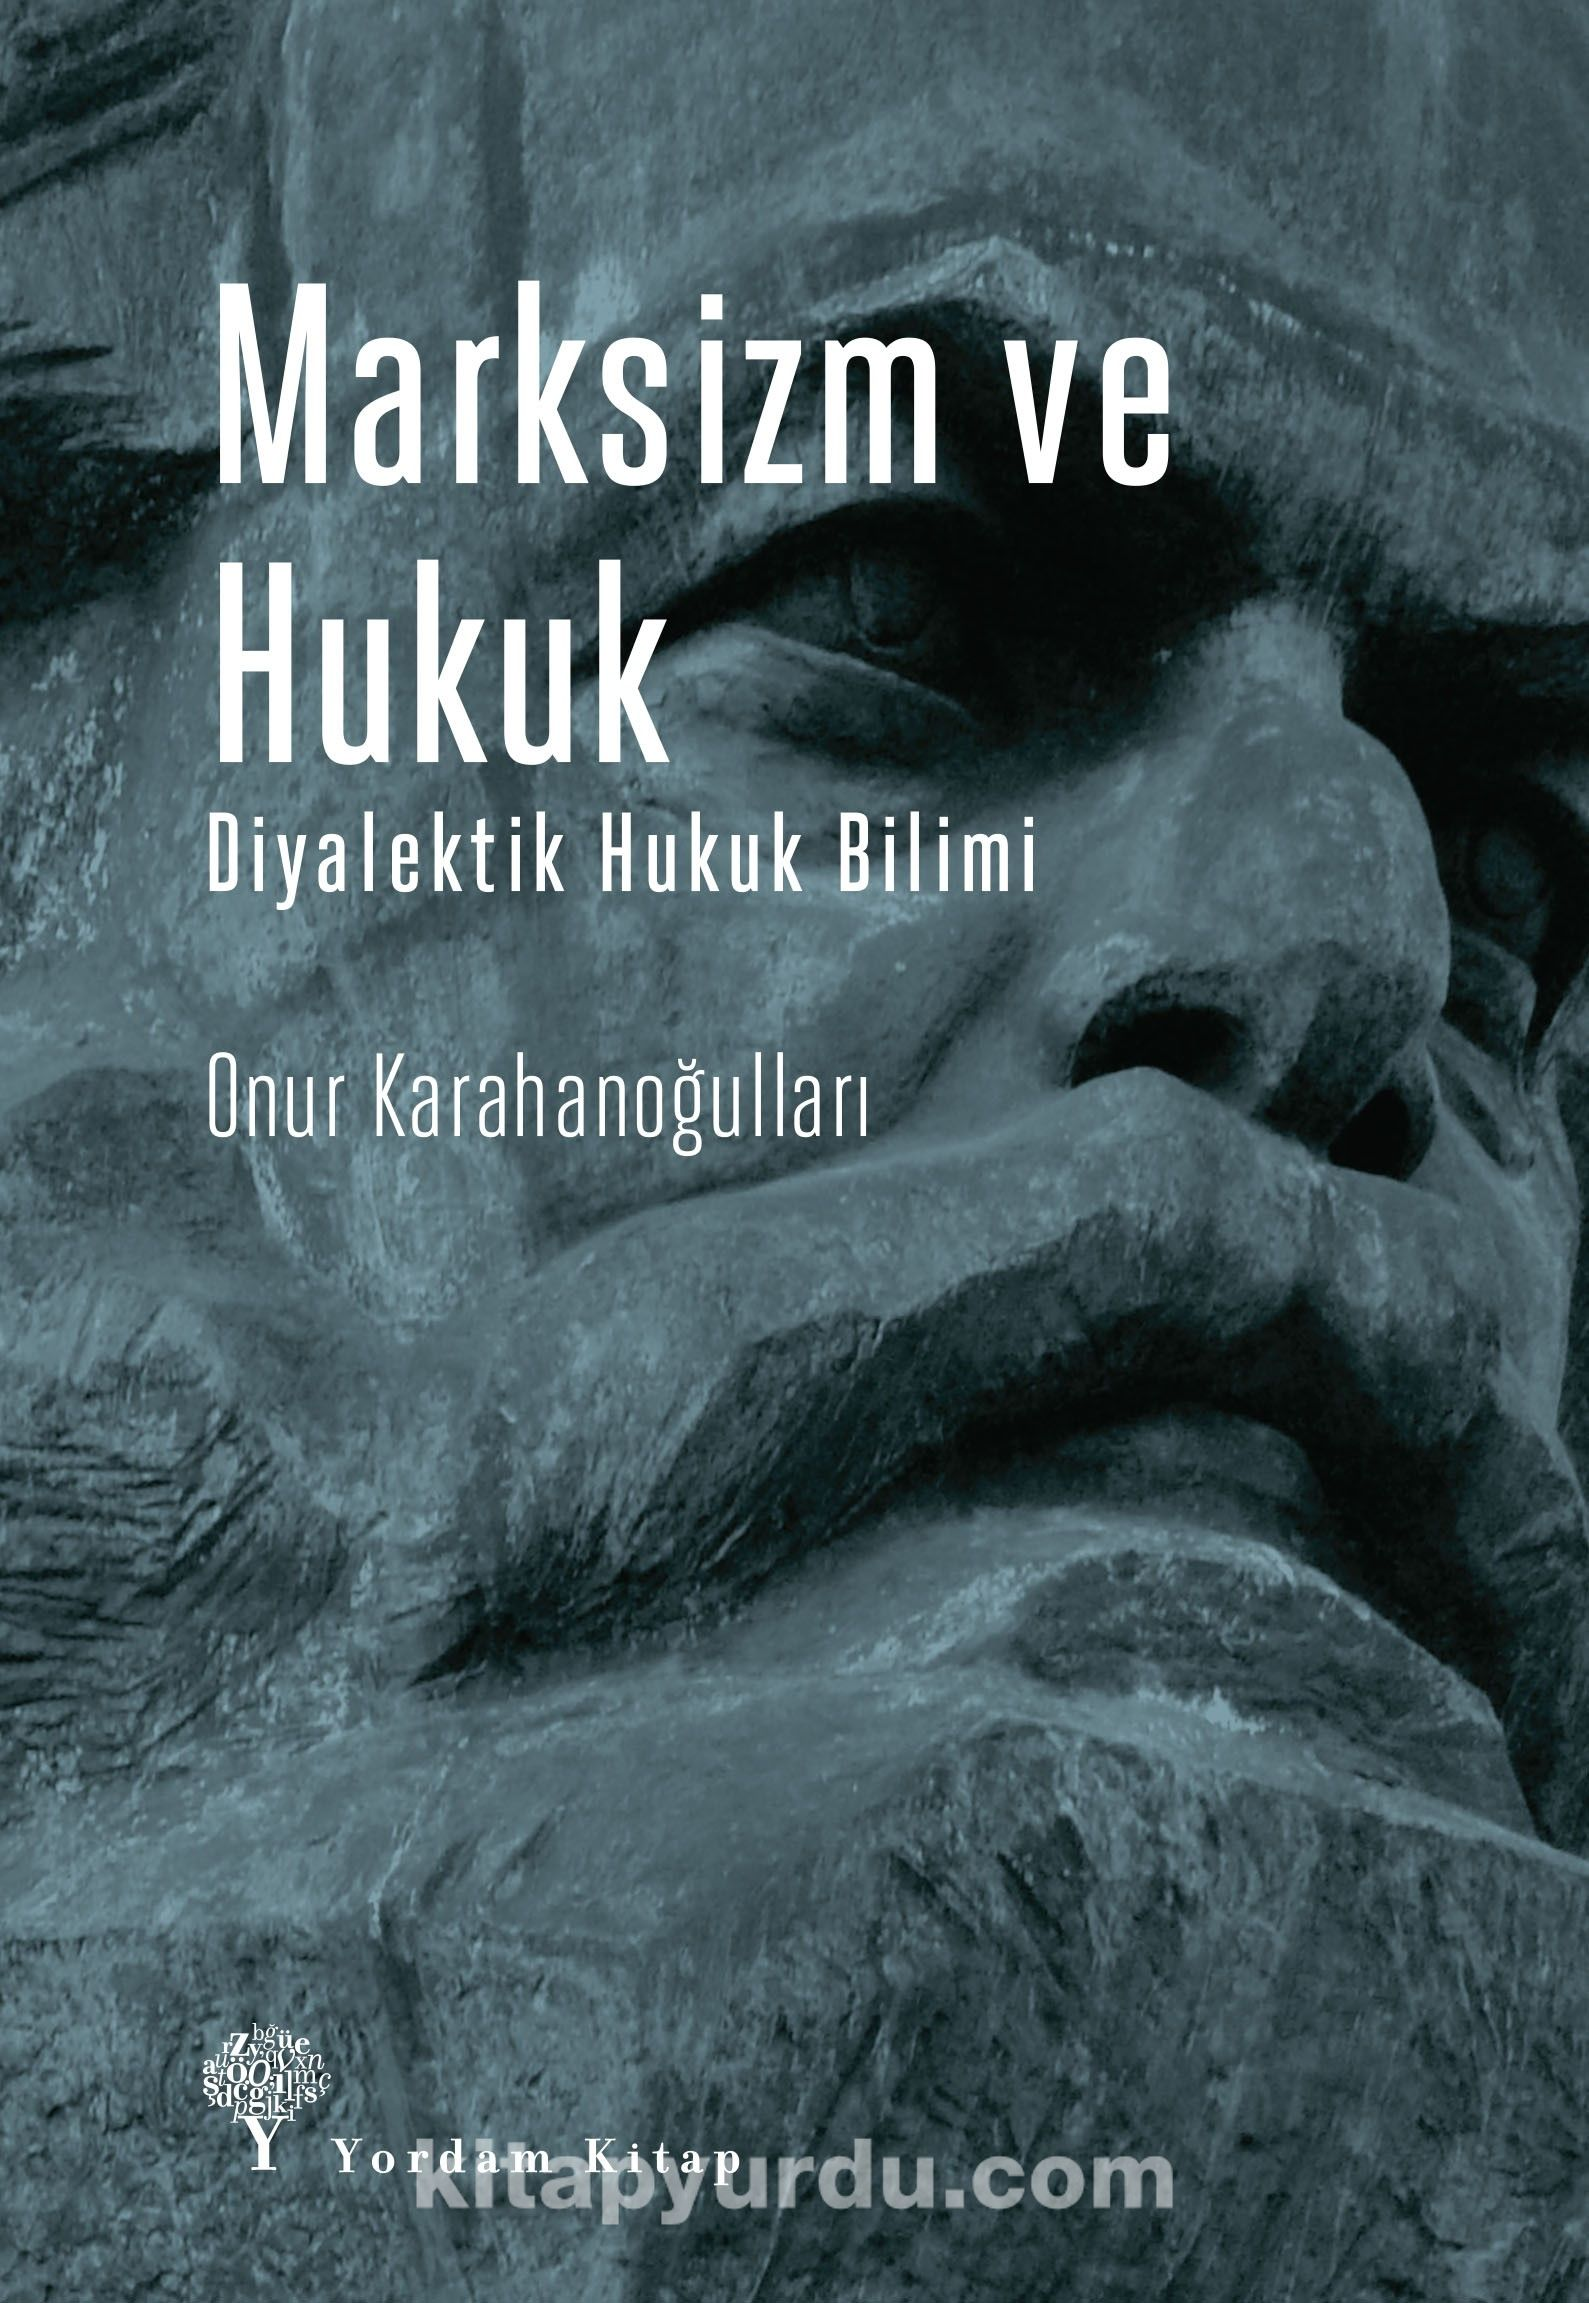 Marksizm ve Hukuk Diyalektik Hukuk Bilimi - Onur Karahanoğulları pdf epub